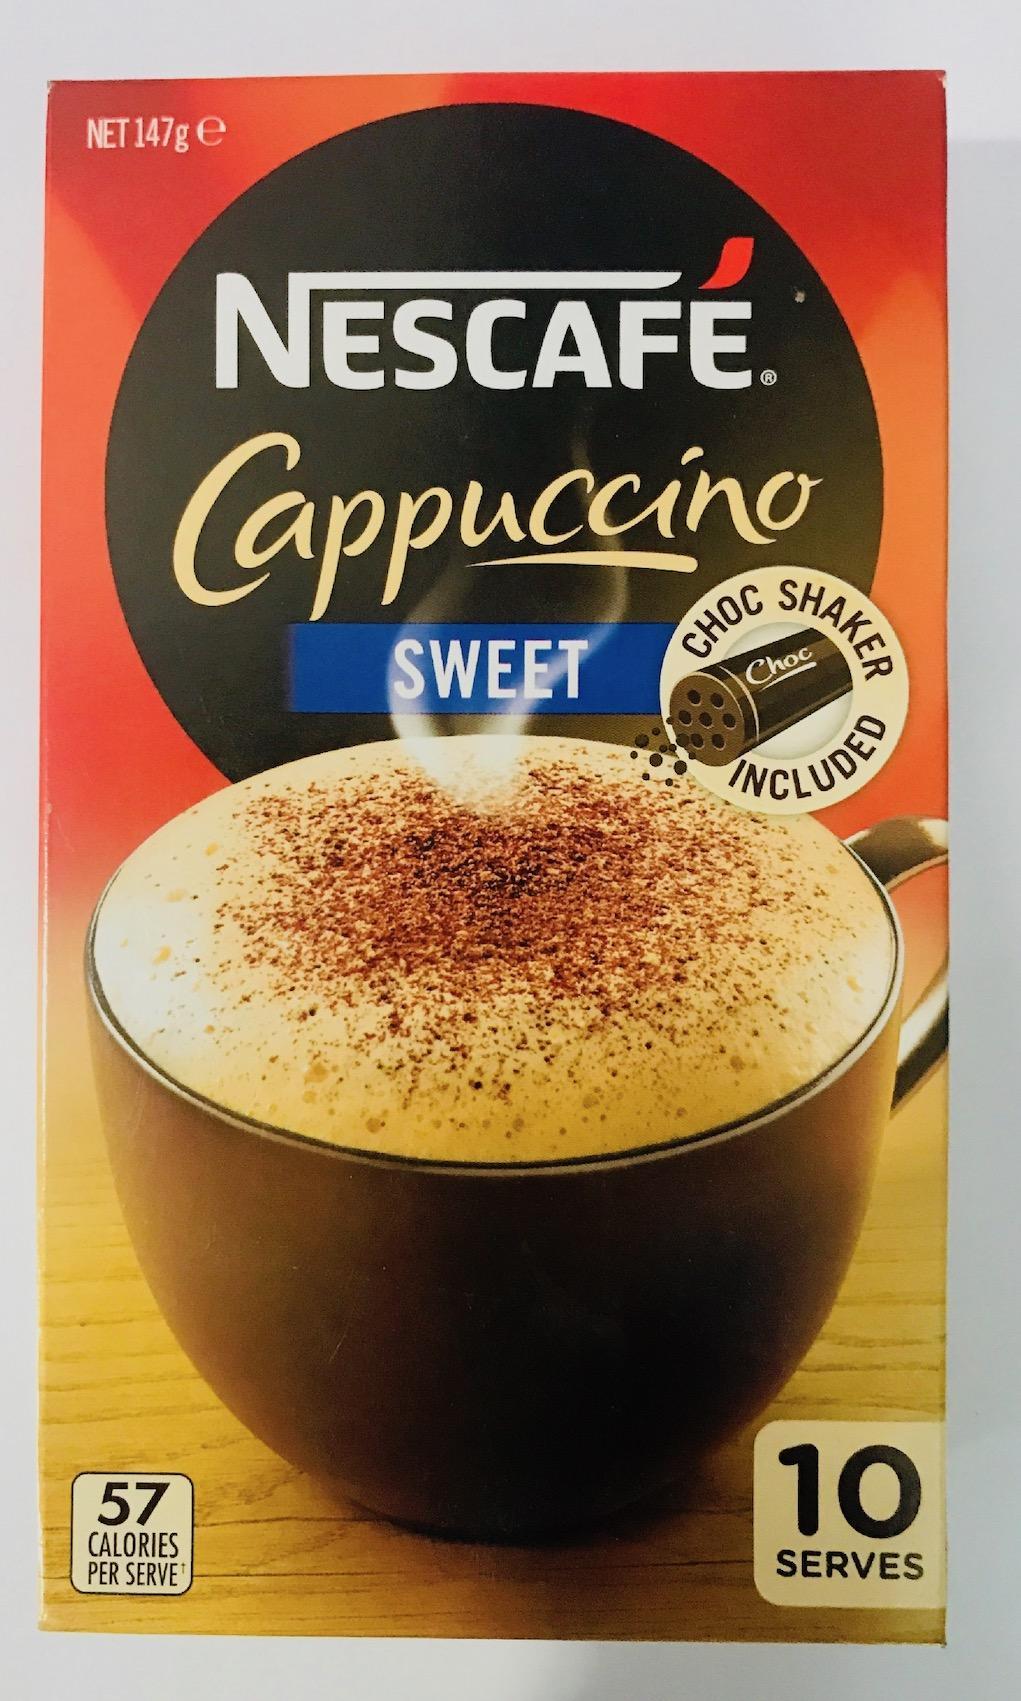 NESCAFEAUSTRALIA Cappucino Sweet Coffee Sachets 10 pack- AU origin